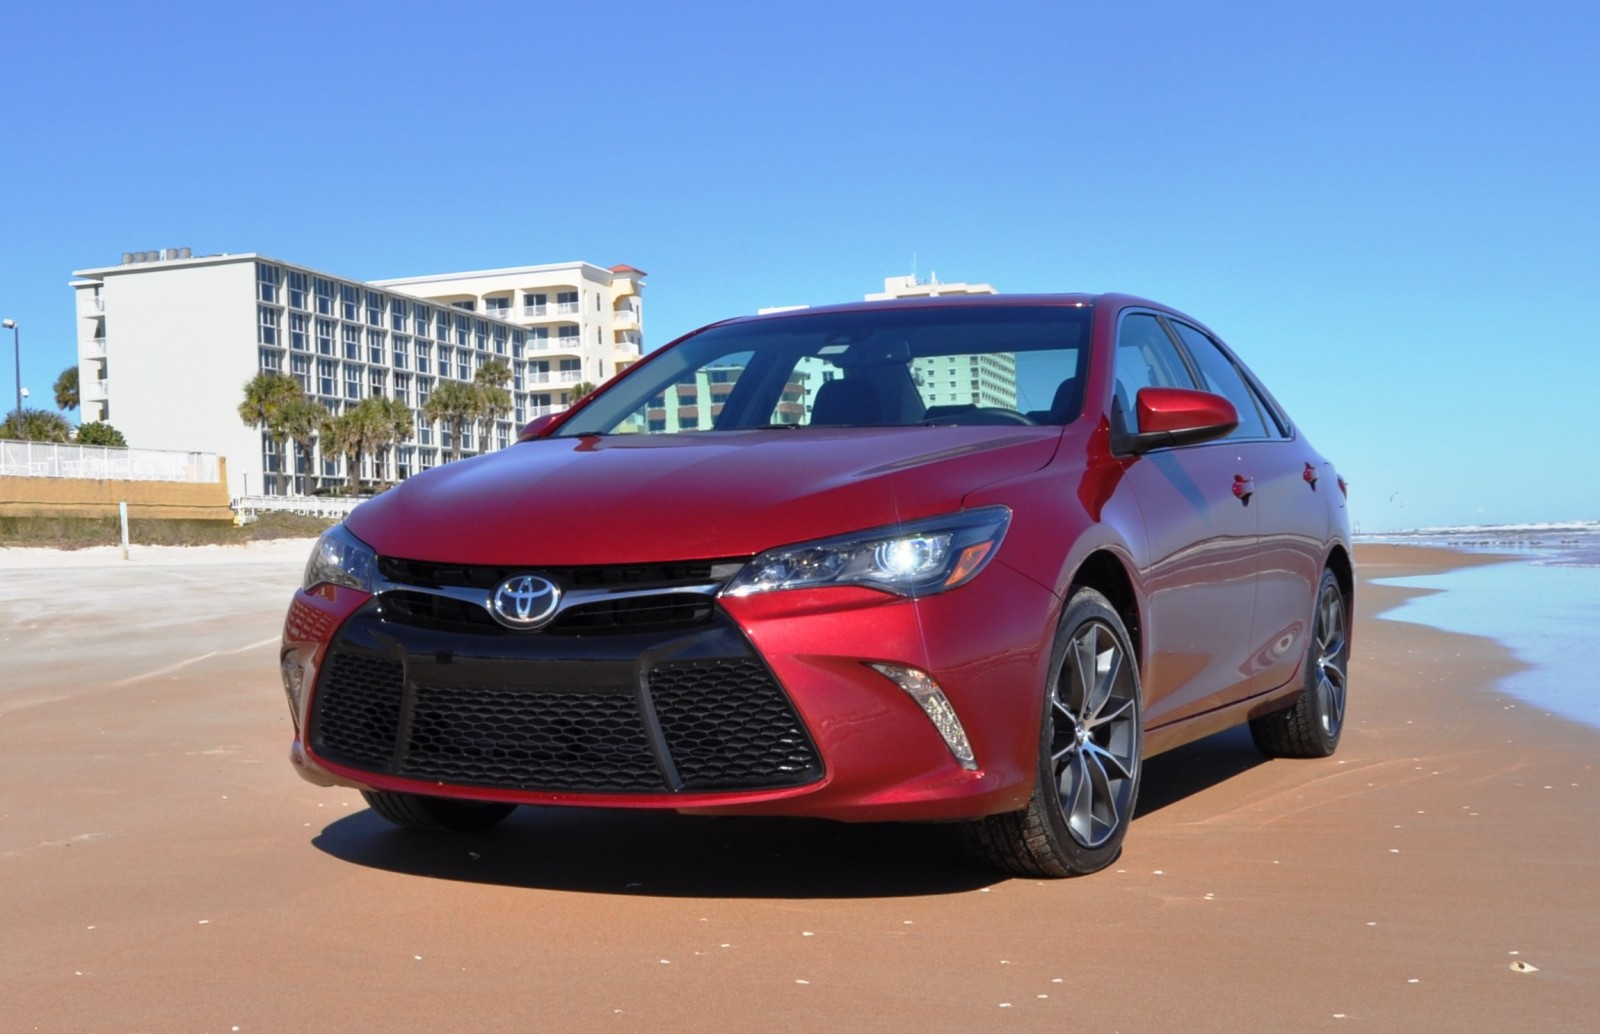 2015 Toyota Camry NASCAR Daytona Beach 50